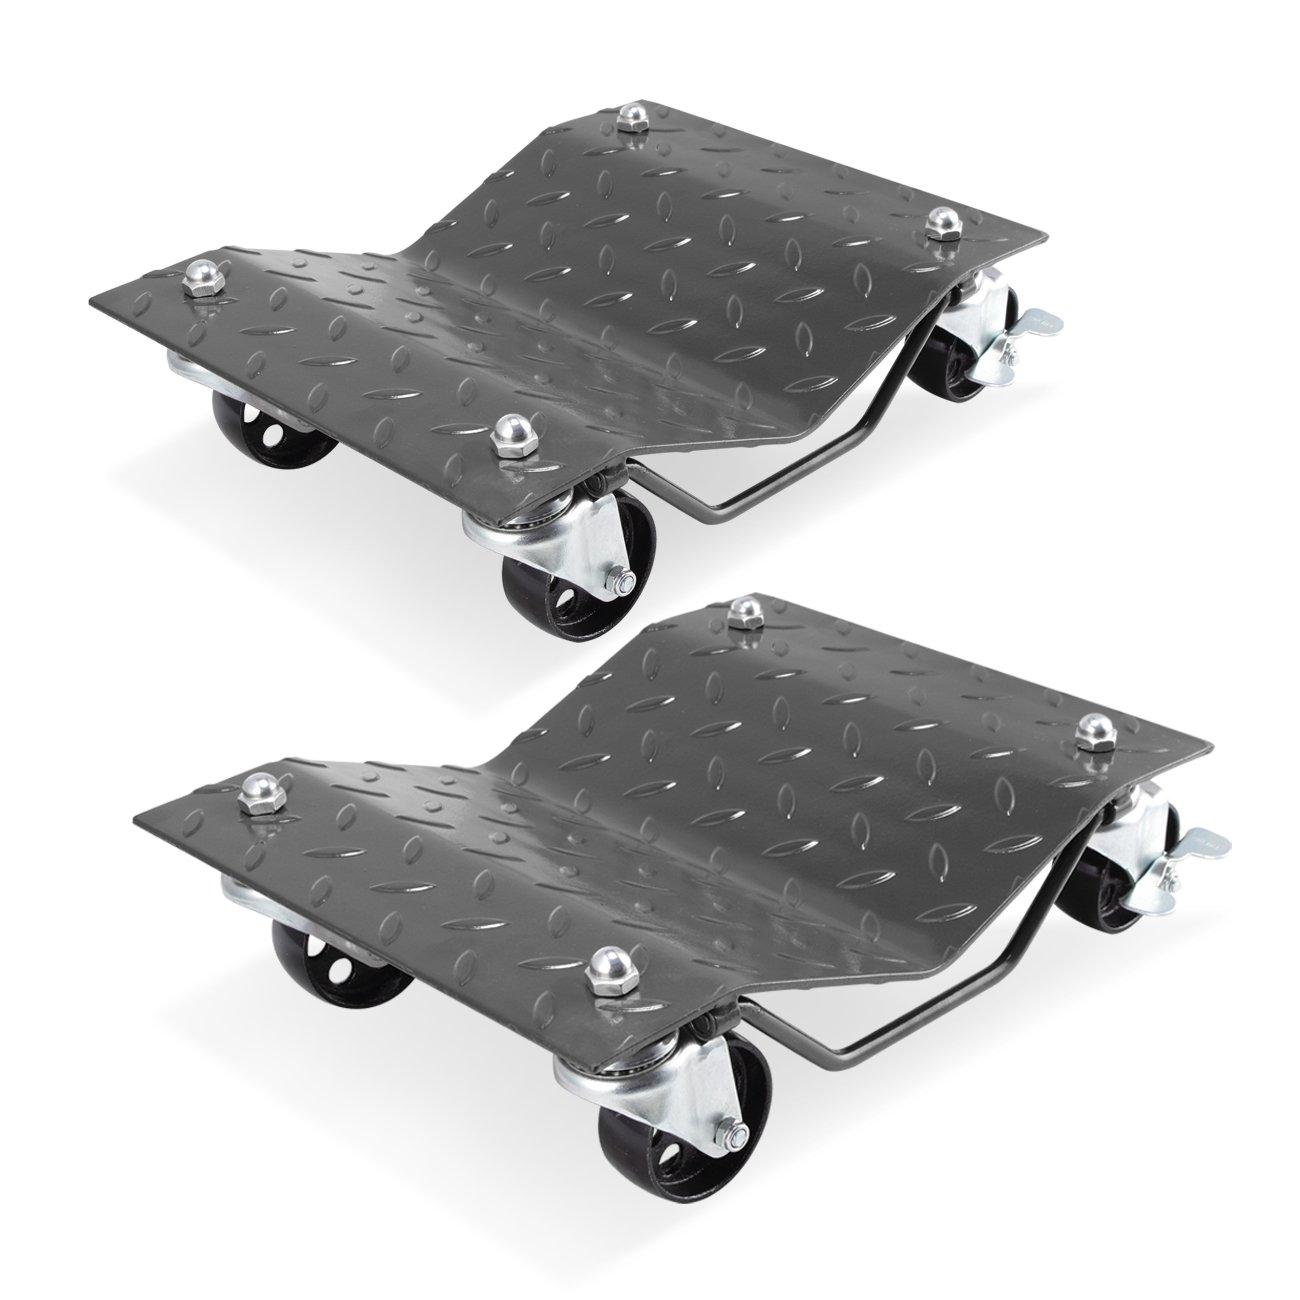 ARKSEN 2 Pcs 1500LB Set Dollies Car Auto Repair Dolly Tire Skates Vehicle Moving Diamond w/Wheels & Lock, Gray